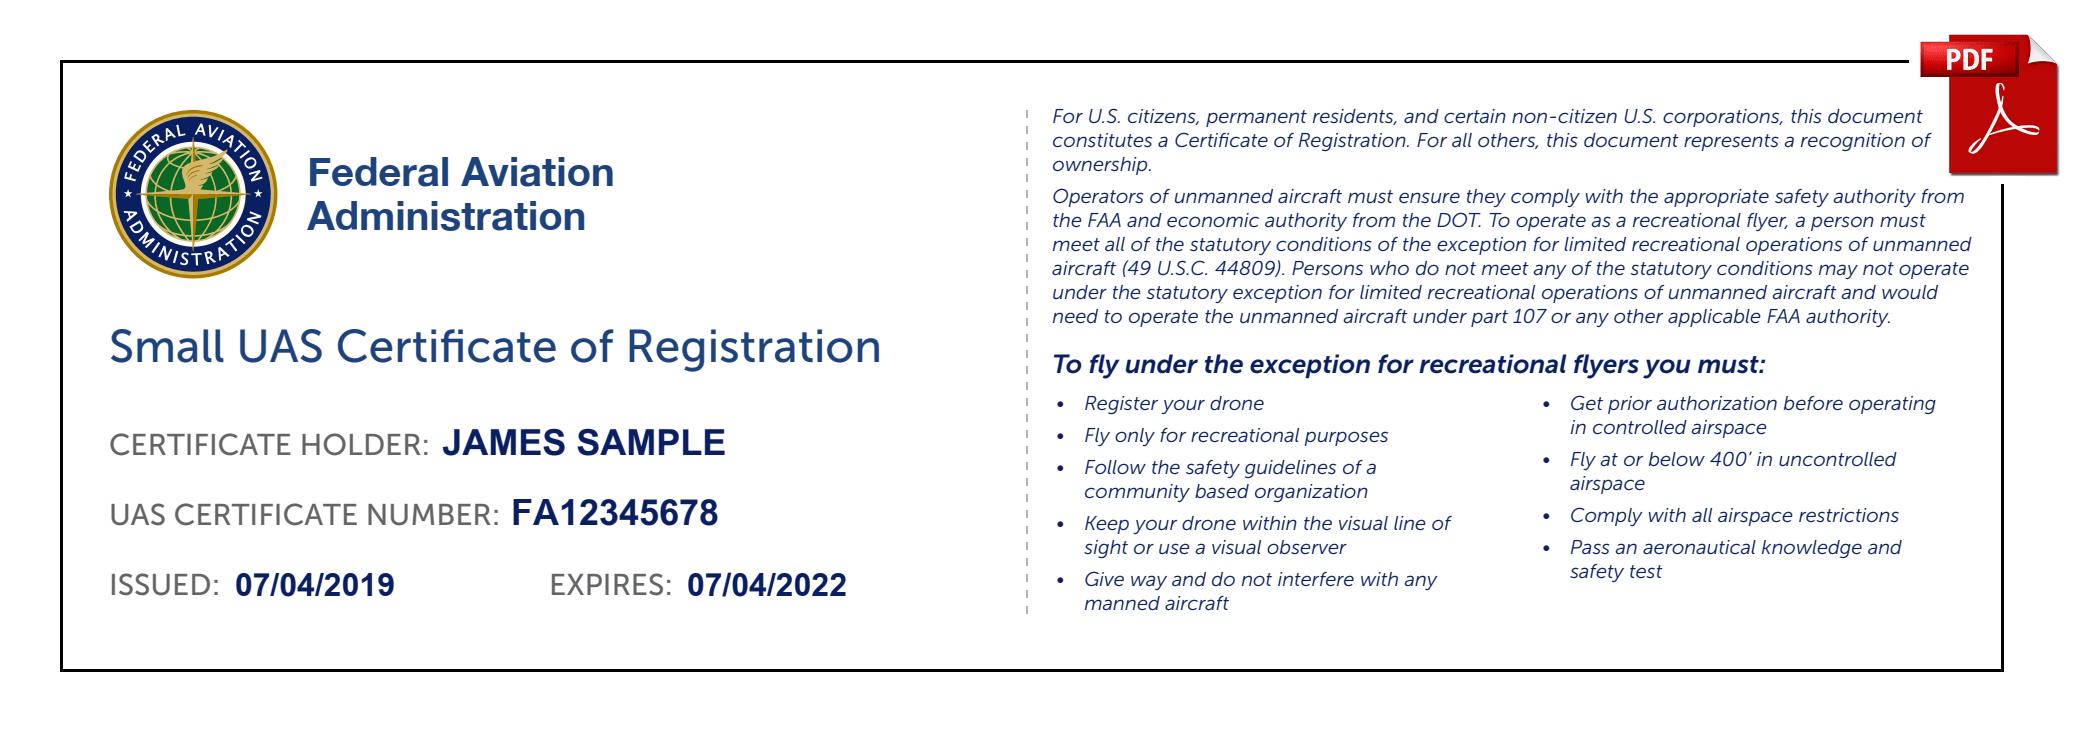 FAA Recreational Drone Registration Renewal - DroneRegistration com